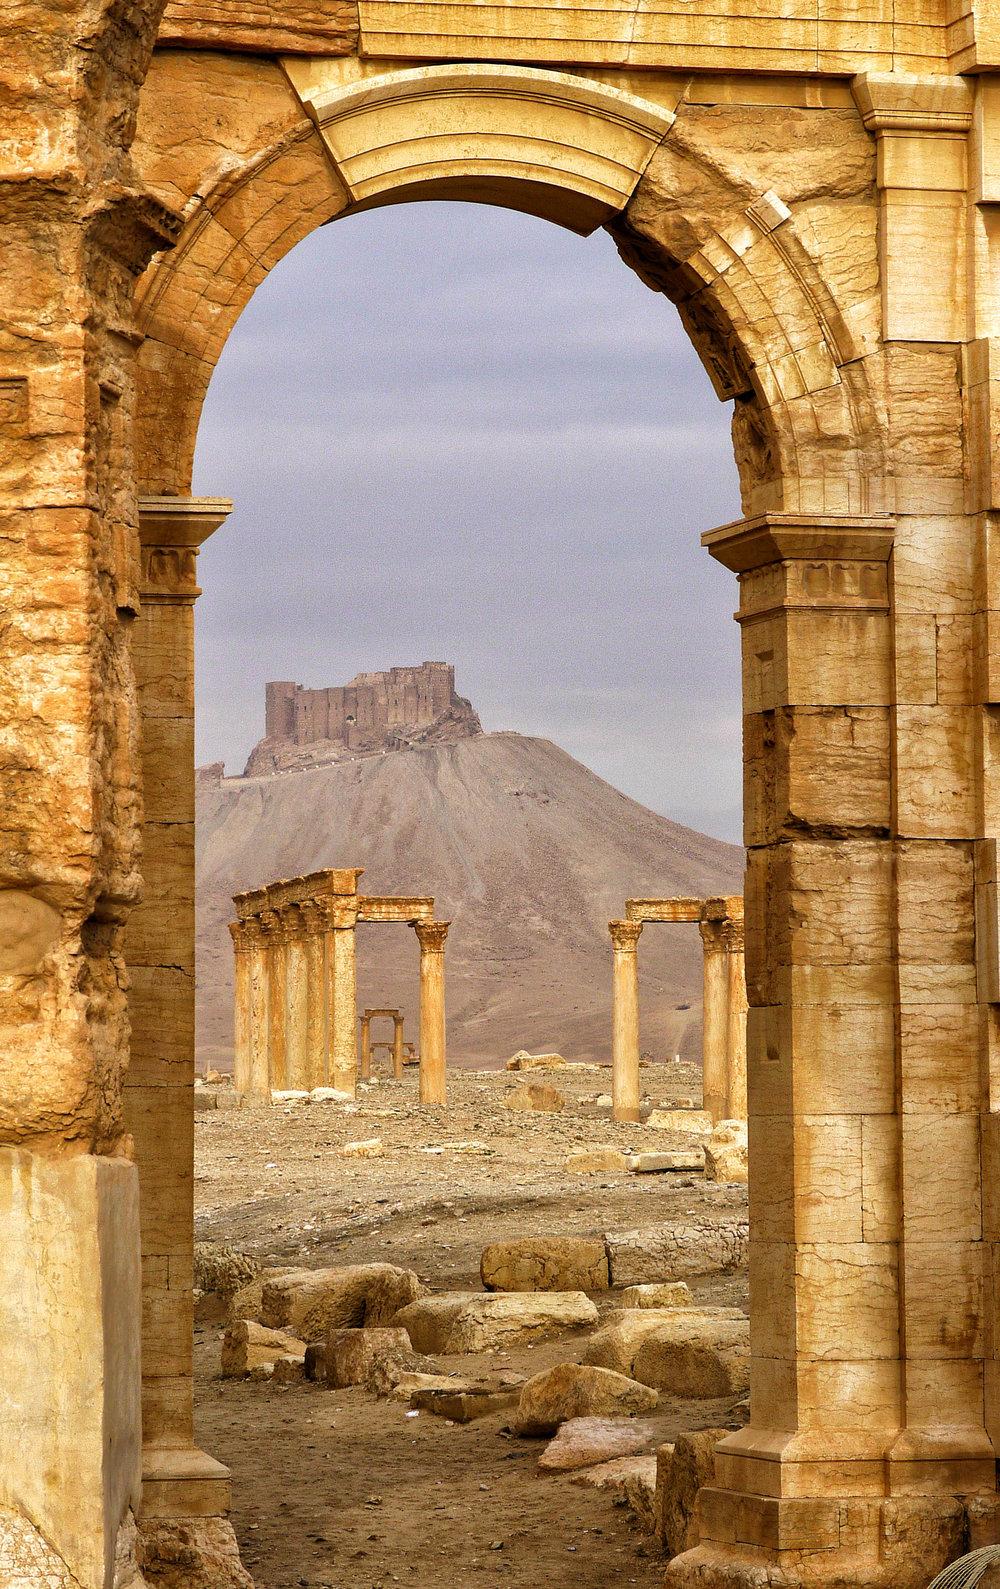 17 Syria 2009 Palmyra 8 (1 of 1).jpg